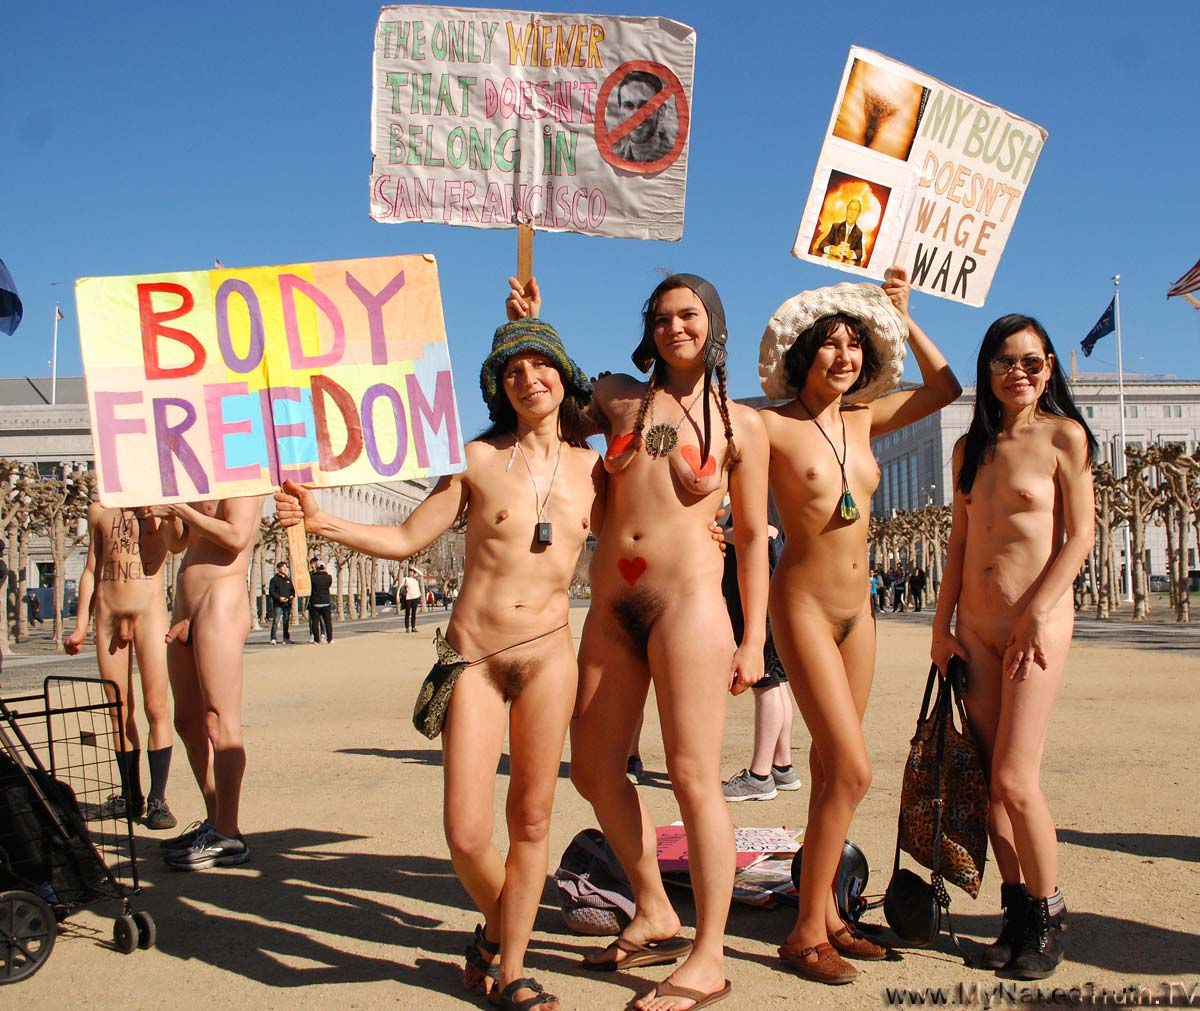 The junior nudist parade are